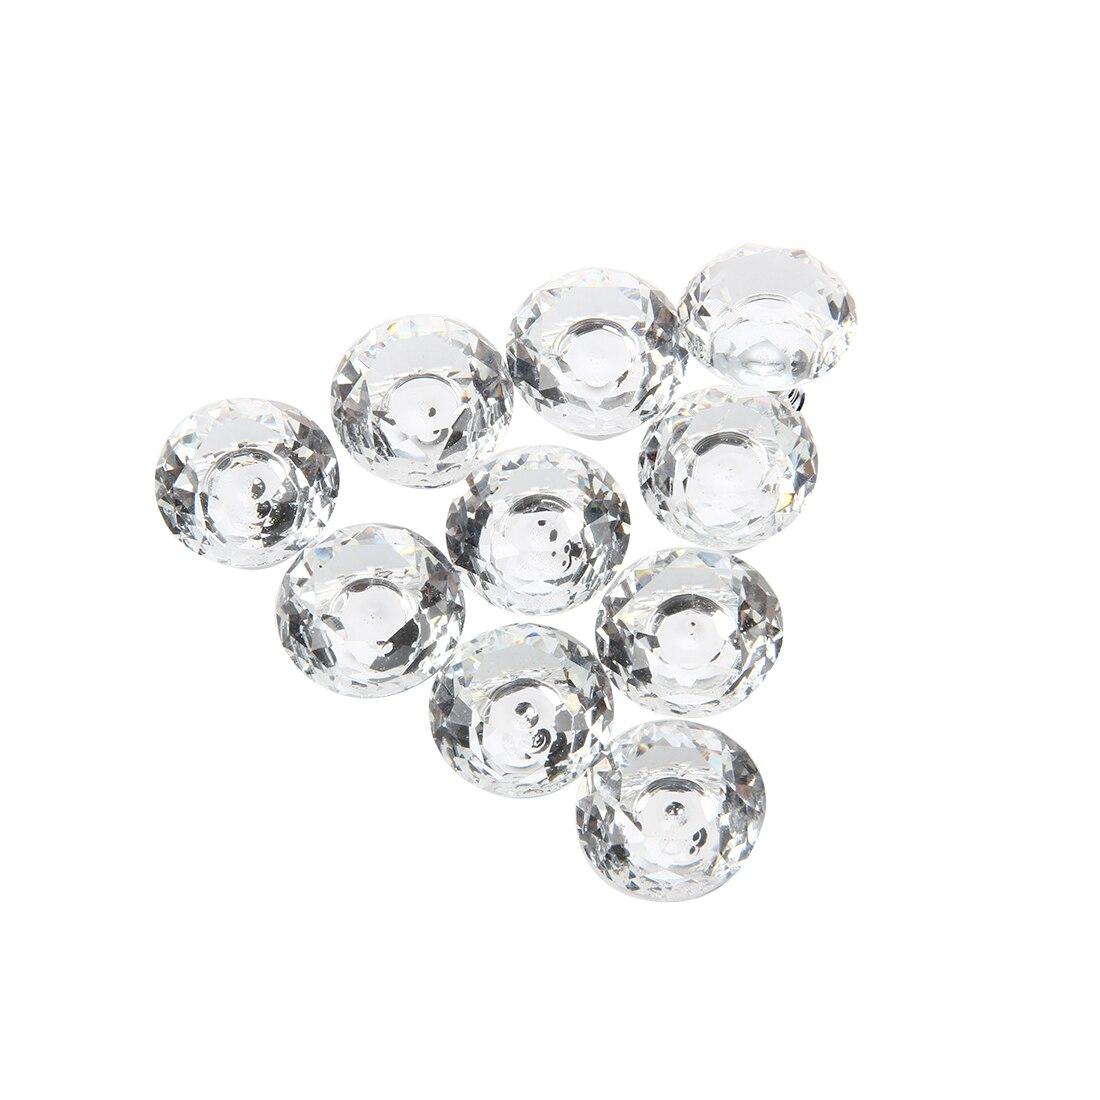 10pcs 30mm Diamond Crystal Glass Door Drawer Cabinet Furniture Handle Knob Screw10pcs 30mm Diamond Crystal Glass Door Drawer Cabinet Furniture Handle Knob Screw